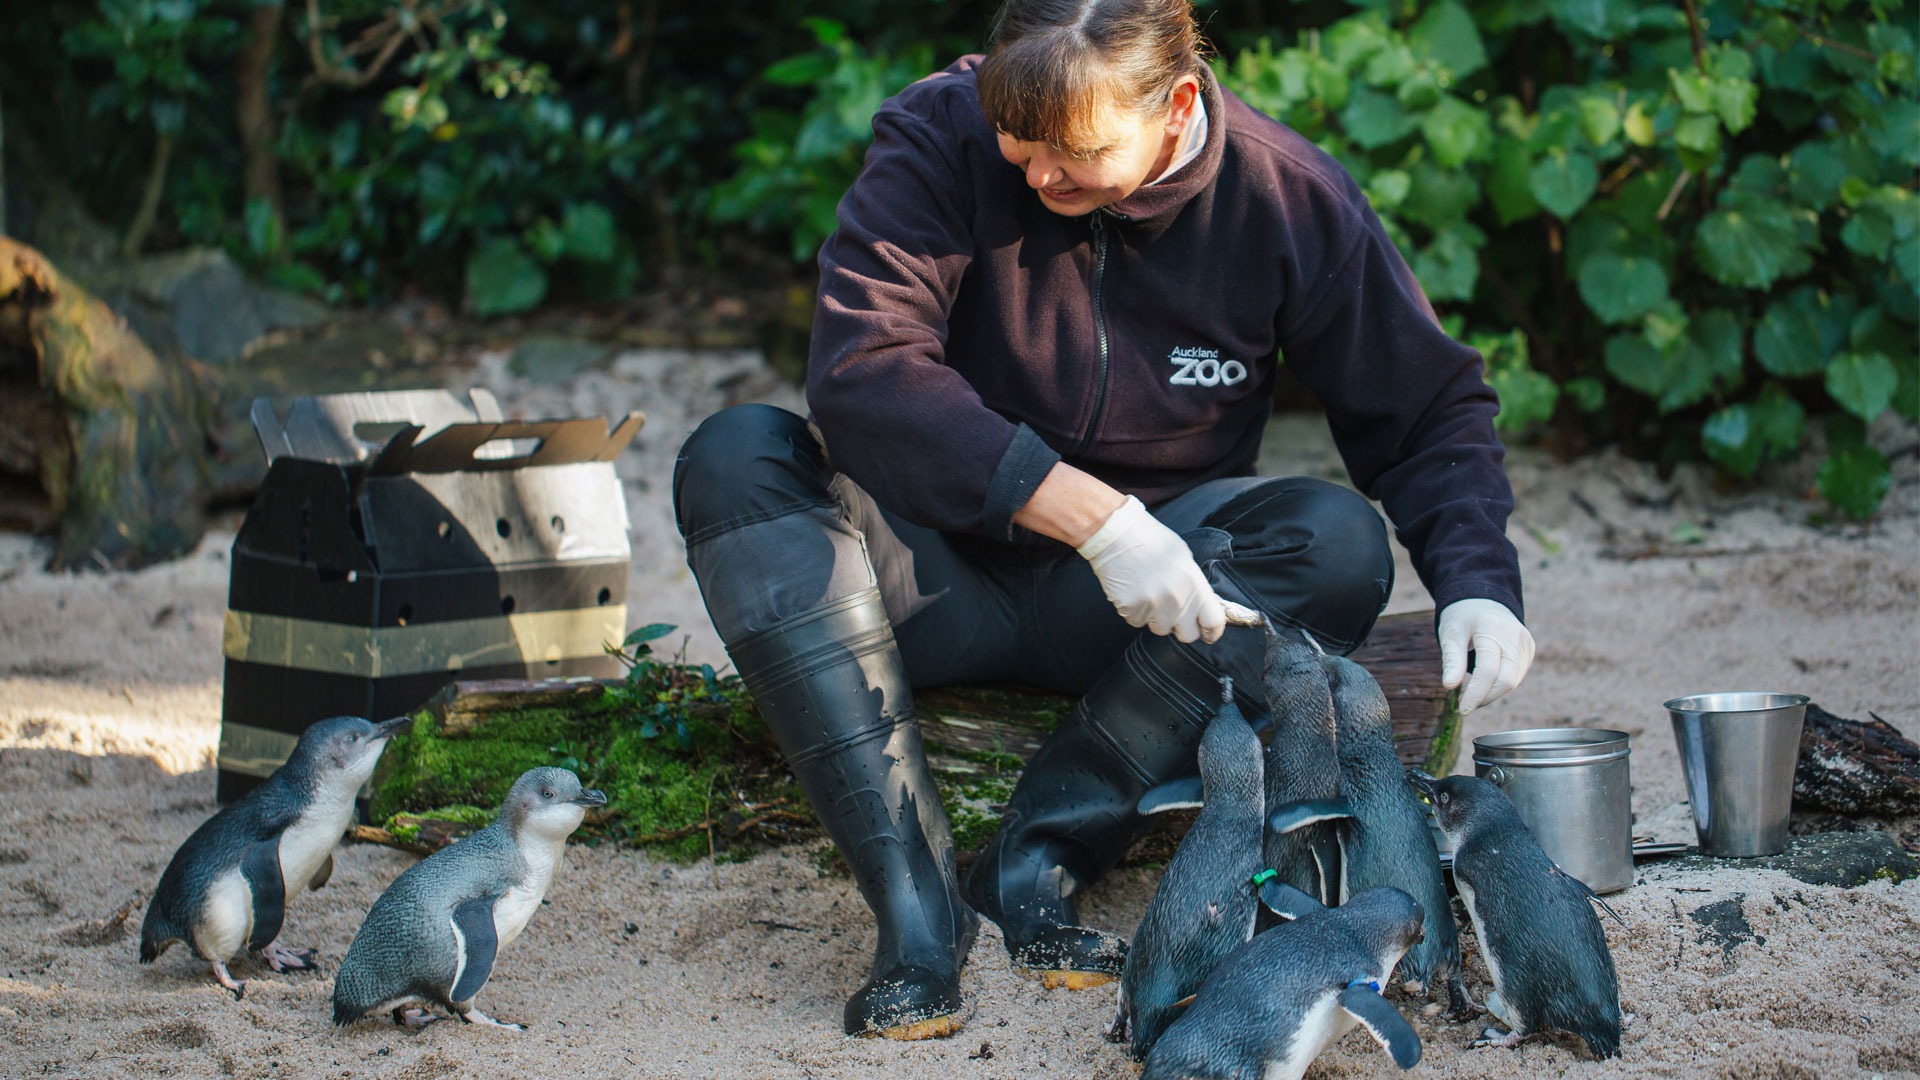 https://rfacdn.nz/zoo/assets/media/little-penguin-paku-gallery-6.jpg